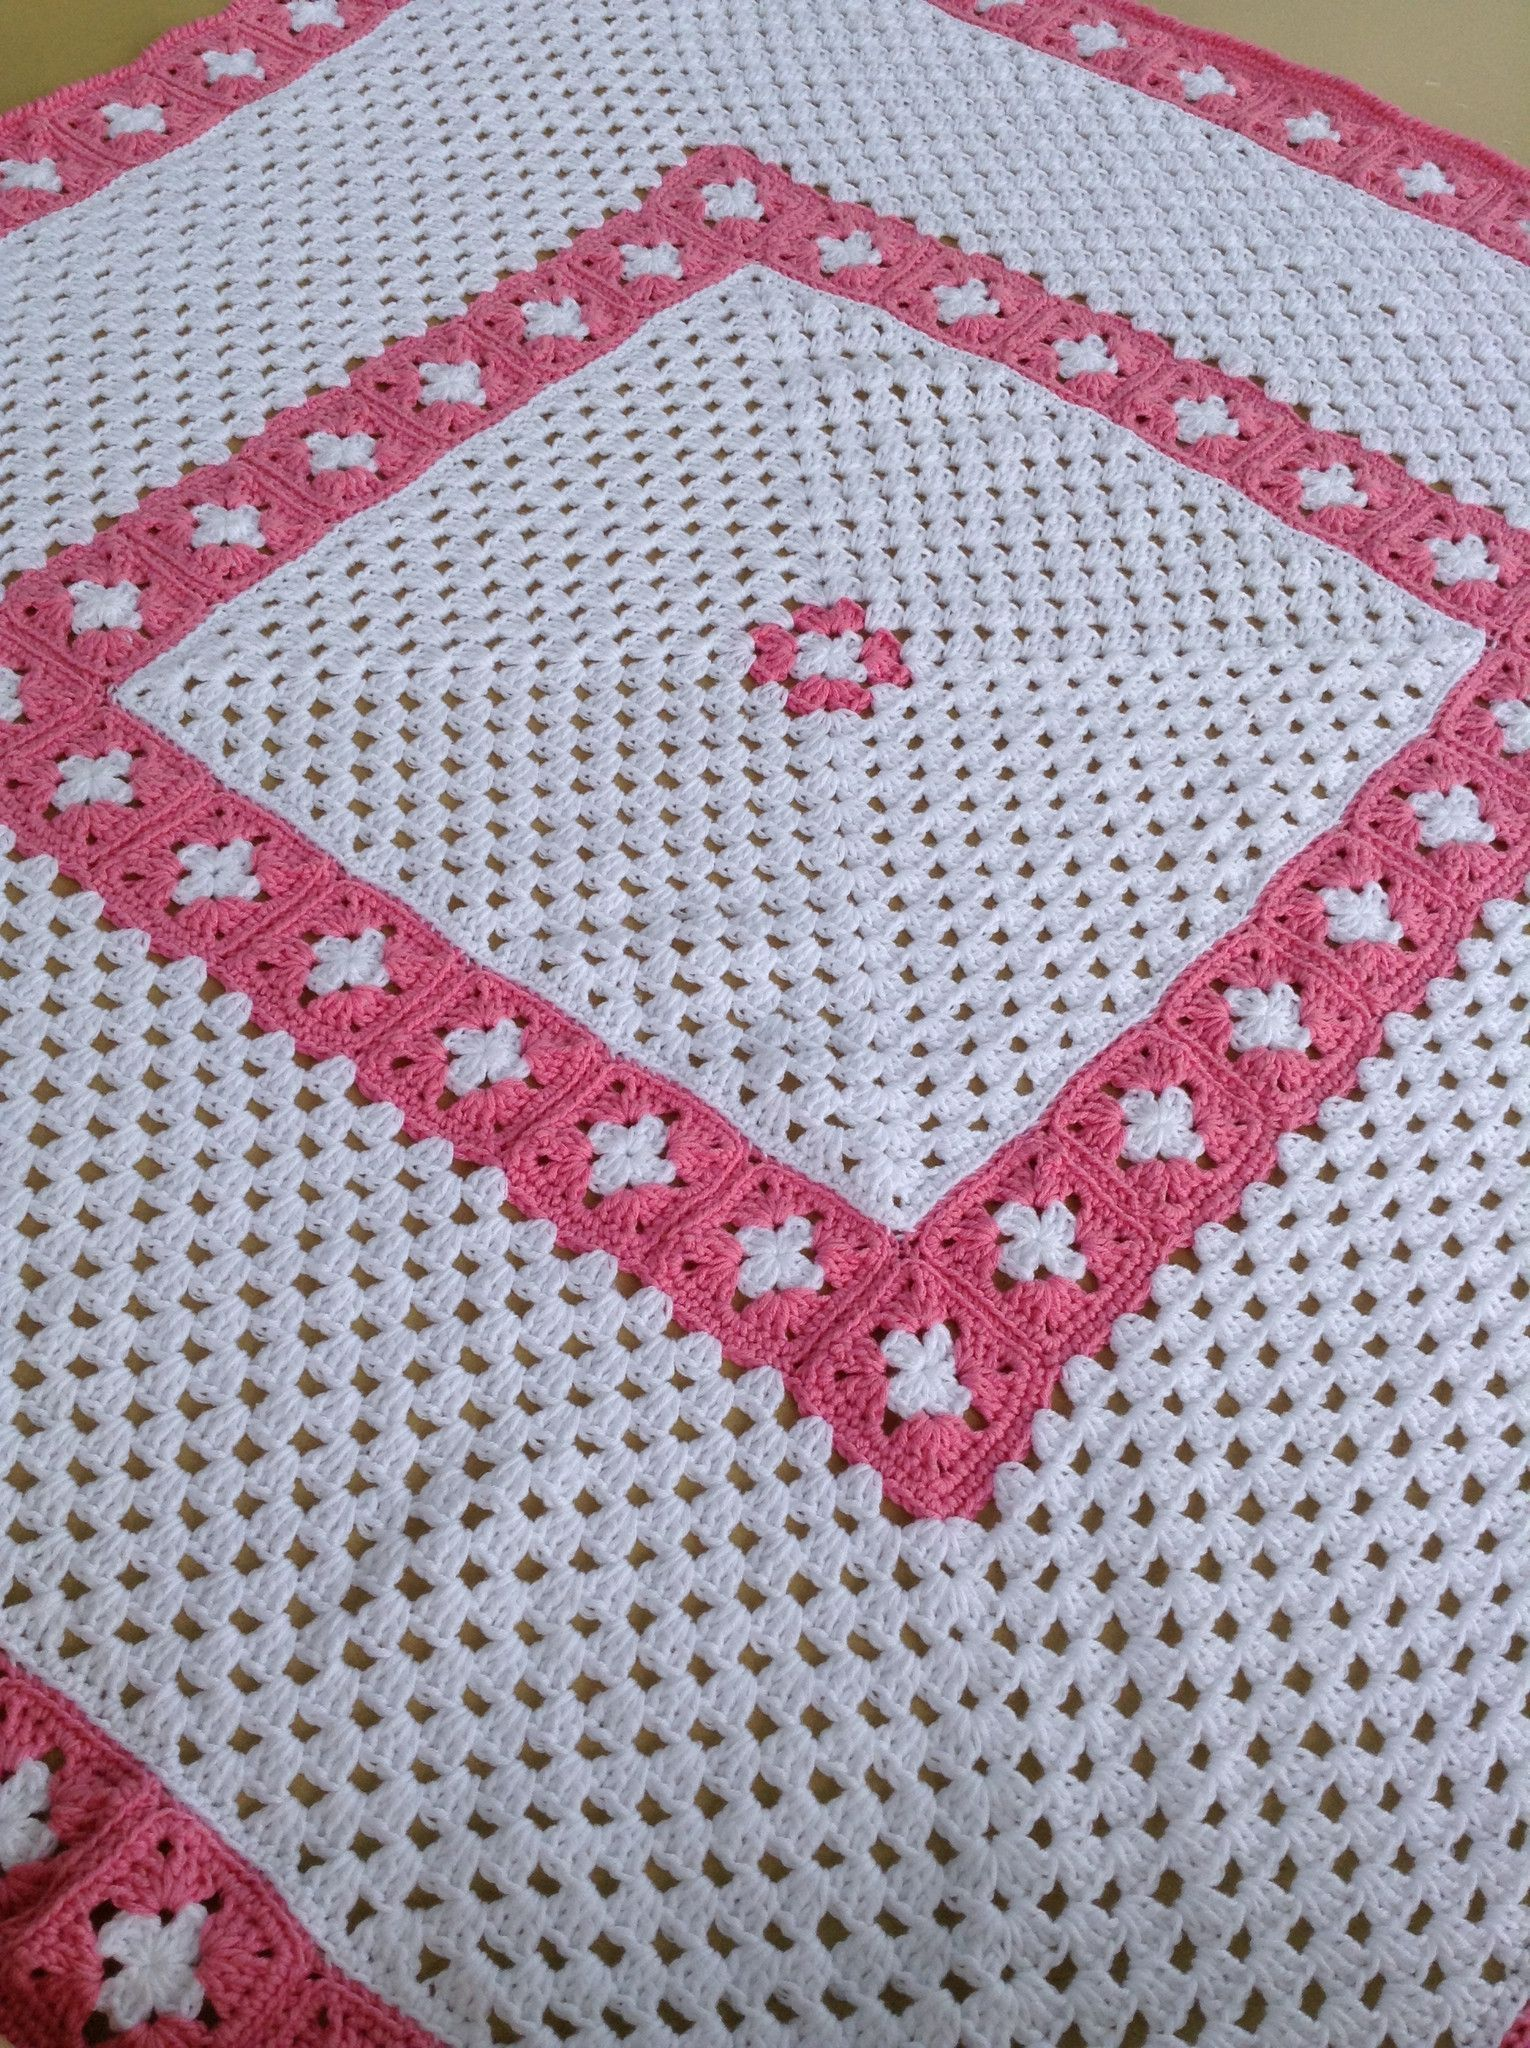 Vintage Granny Square Layette Crochet Pattern | Pinterest | Stoffe ...